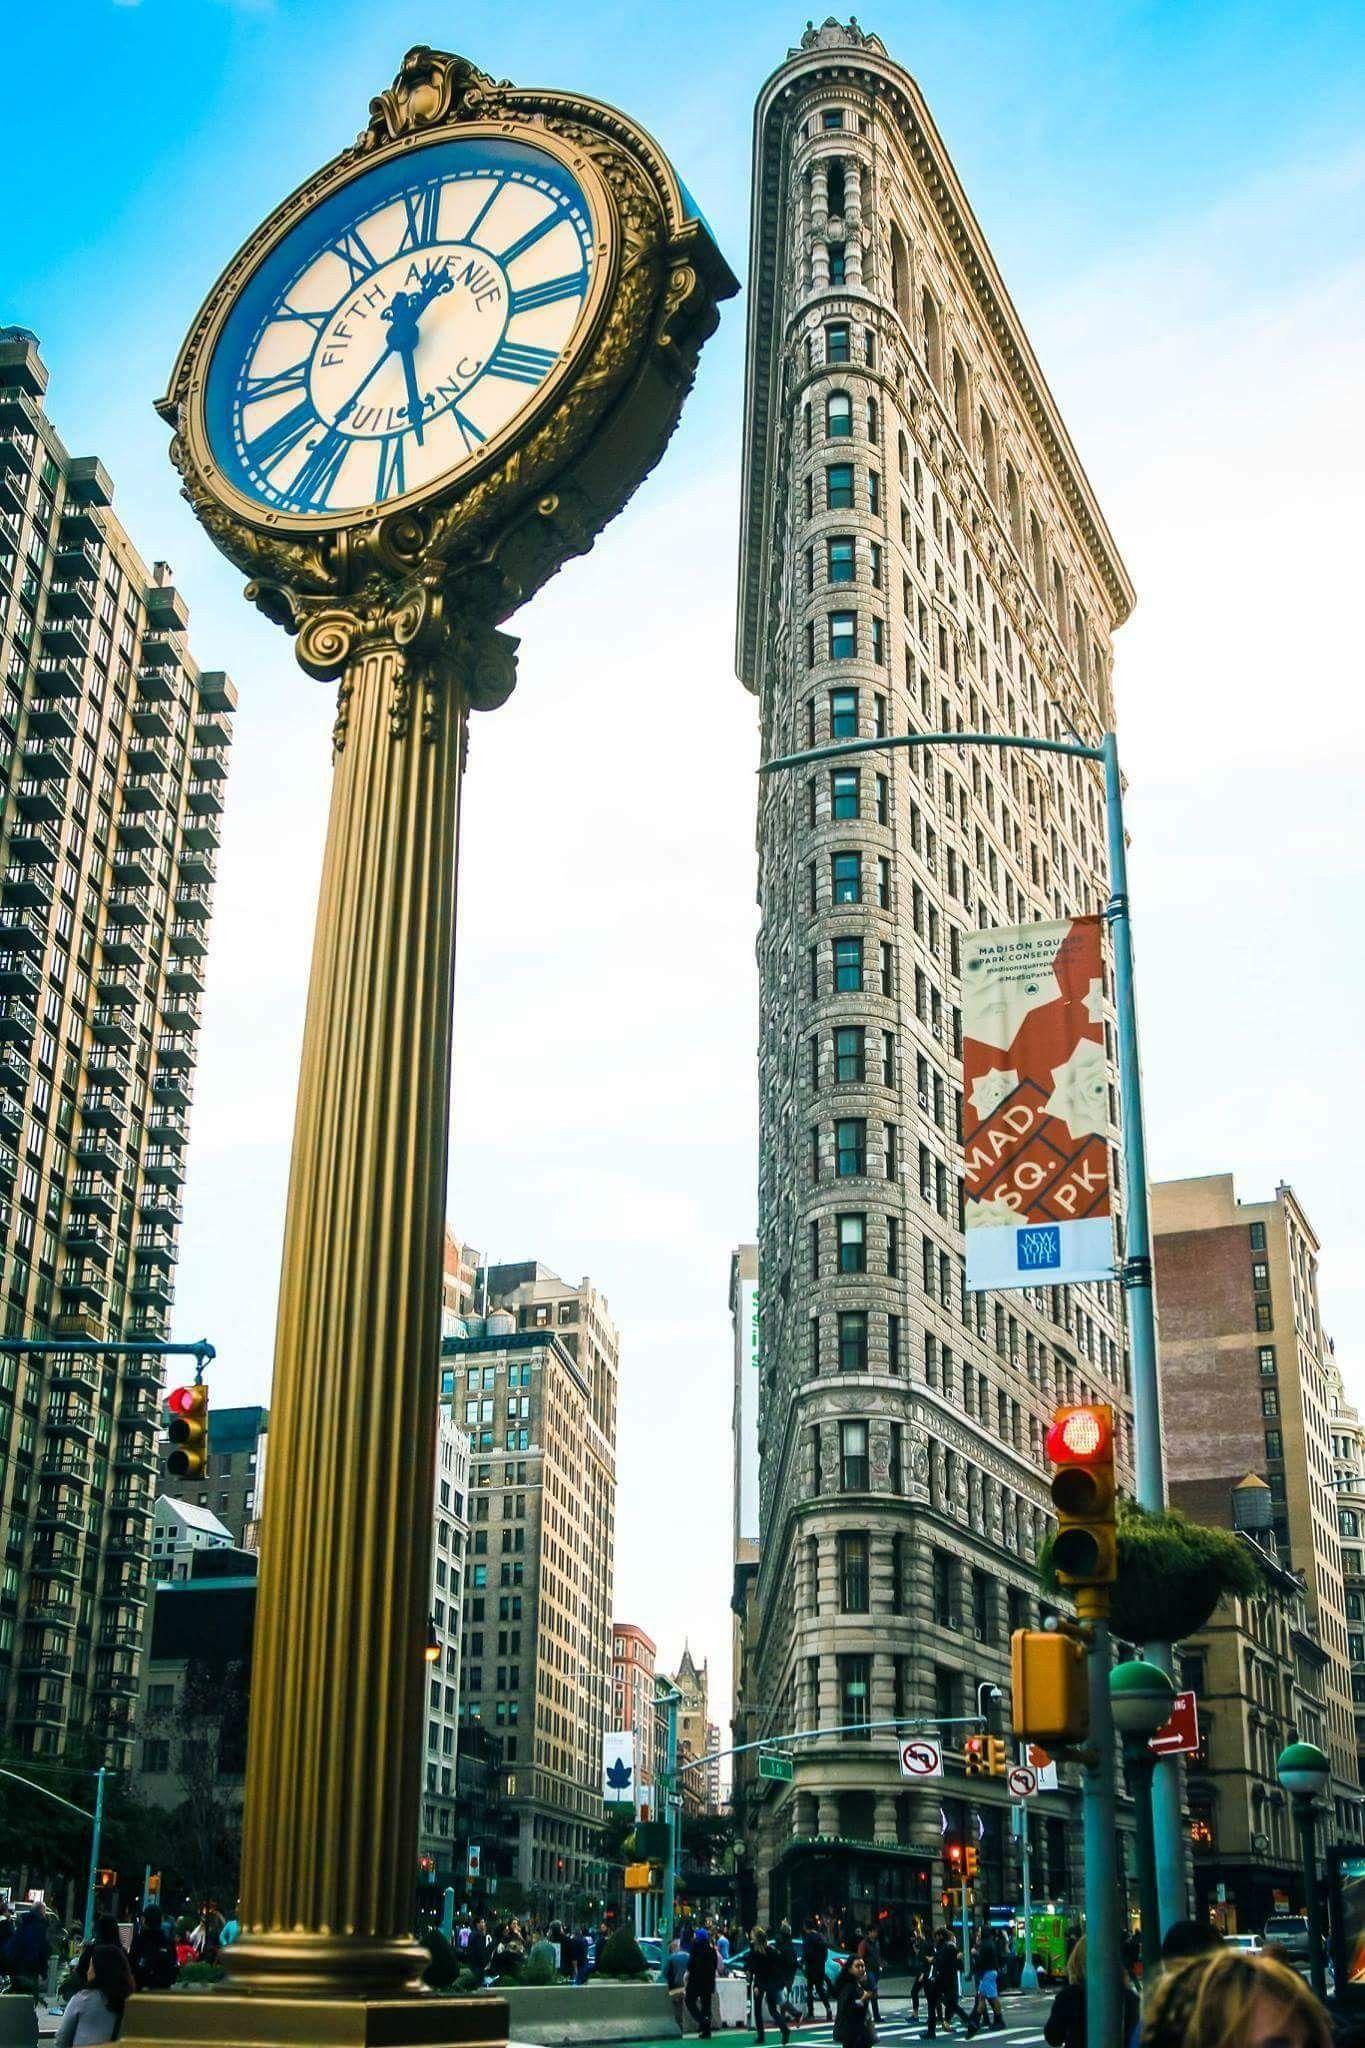 Pin by Corrie on New York Visit new york city, Flatiron